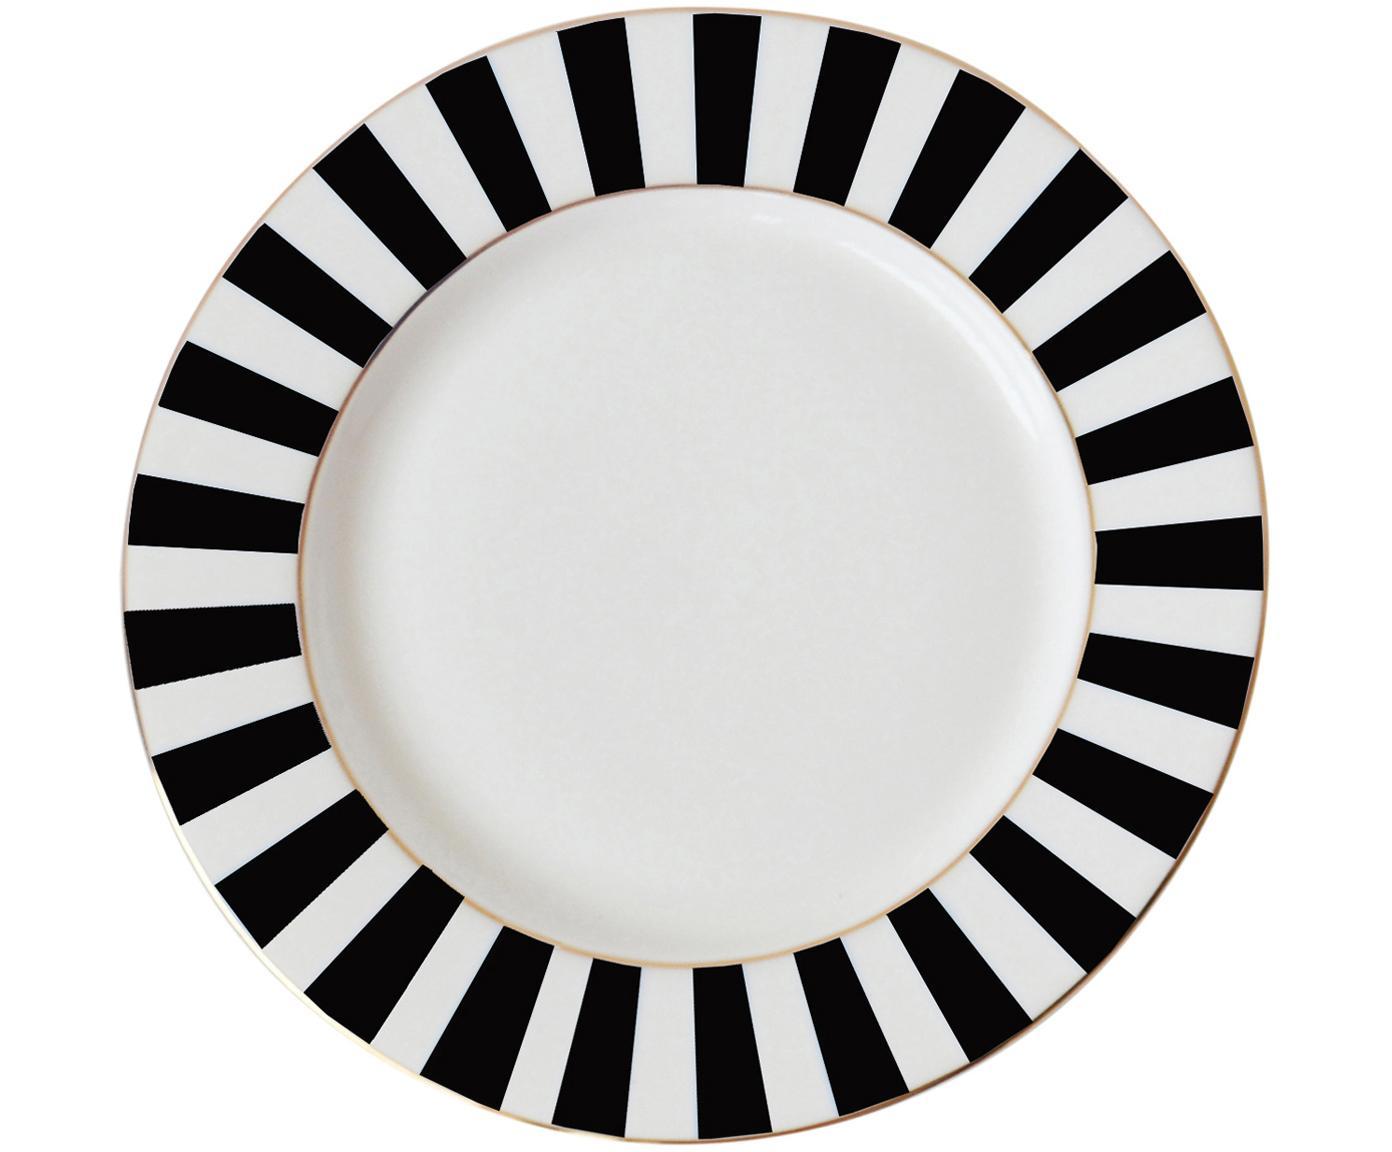 Plato postre Stripy, Porcelana, Negro, blanco, Ø 19 cm